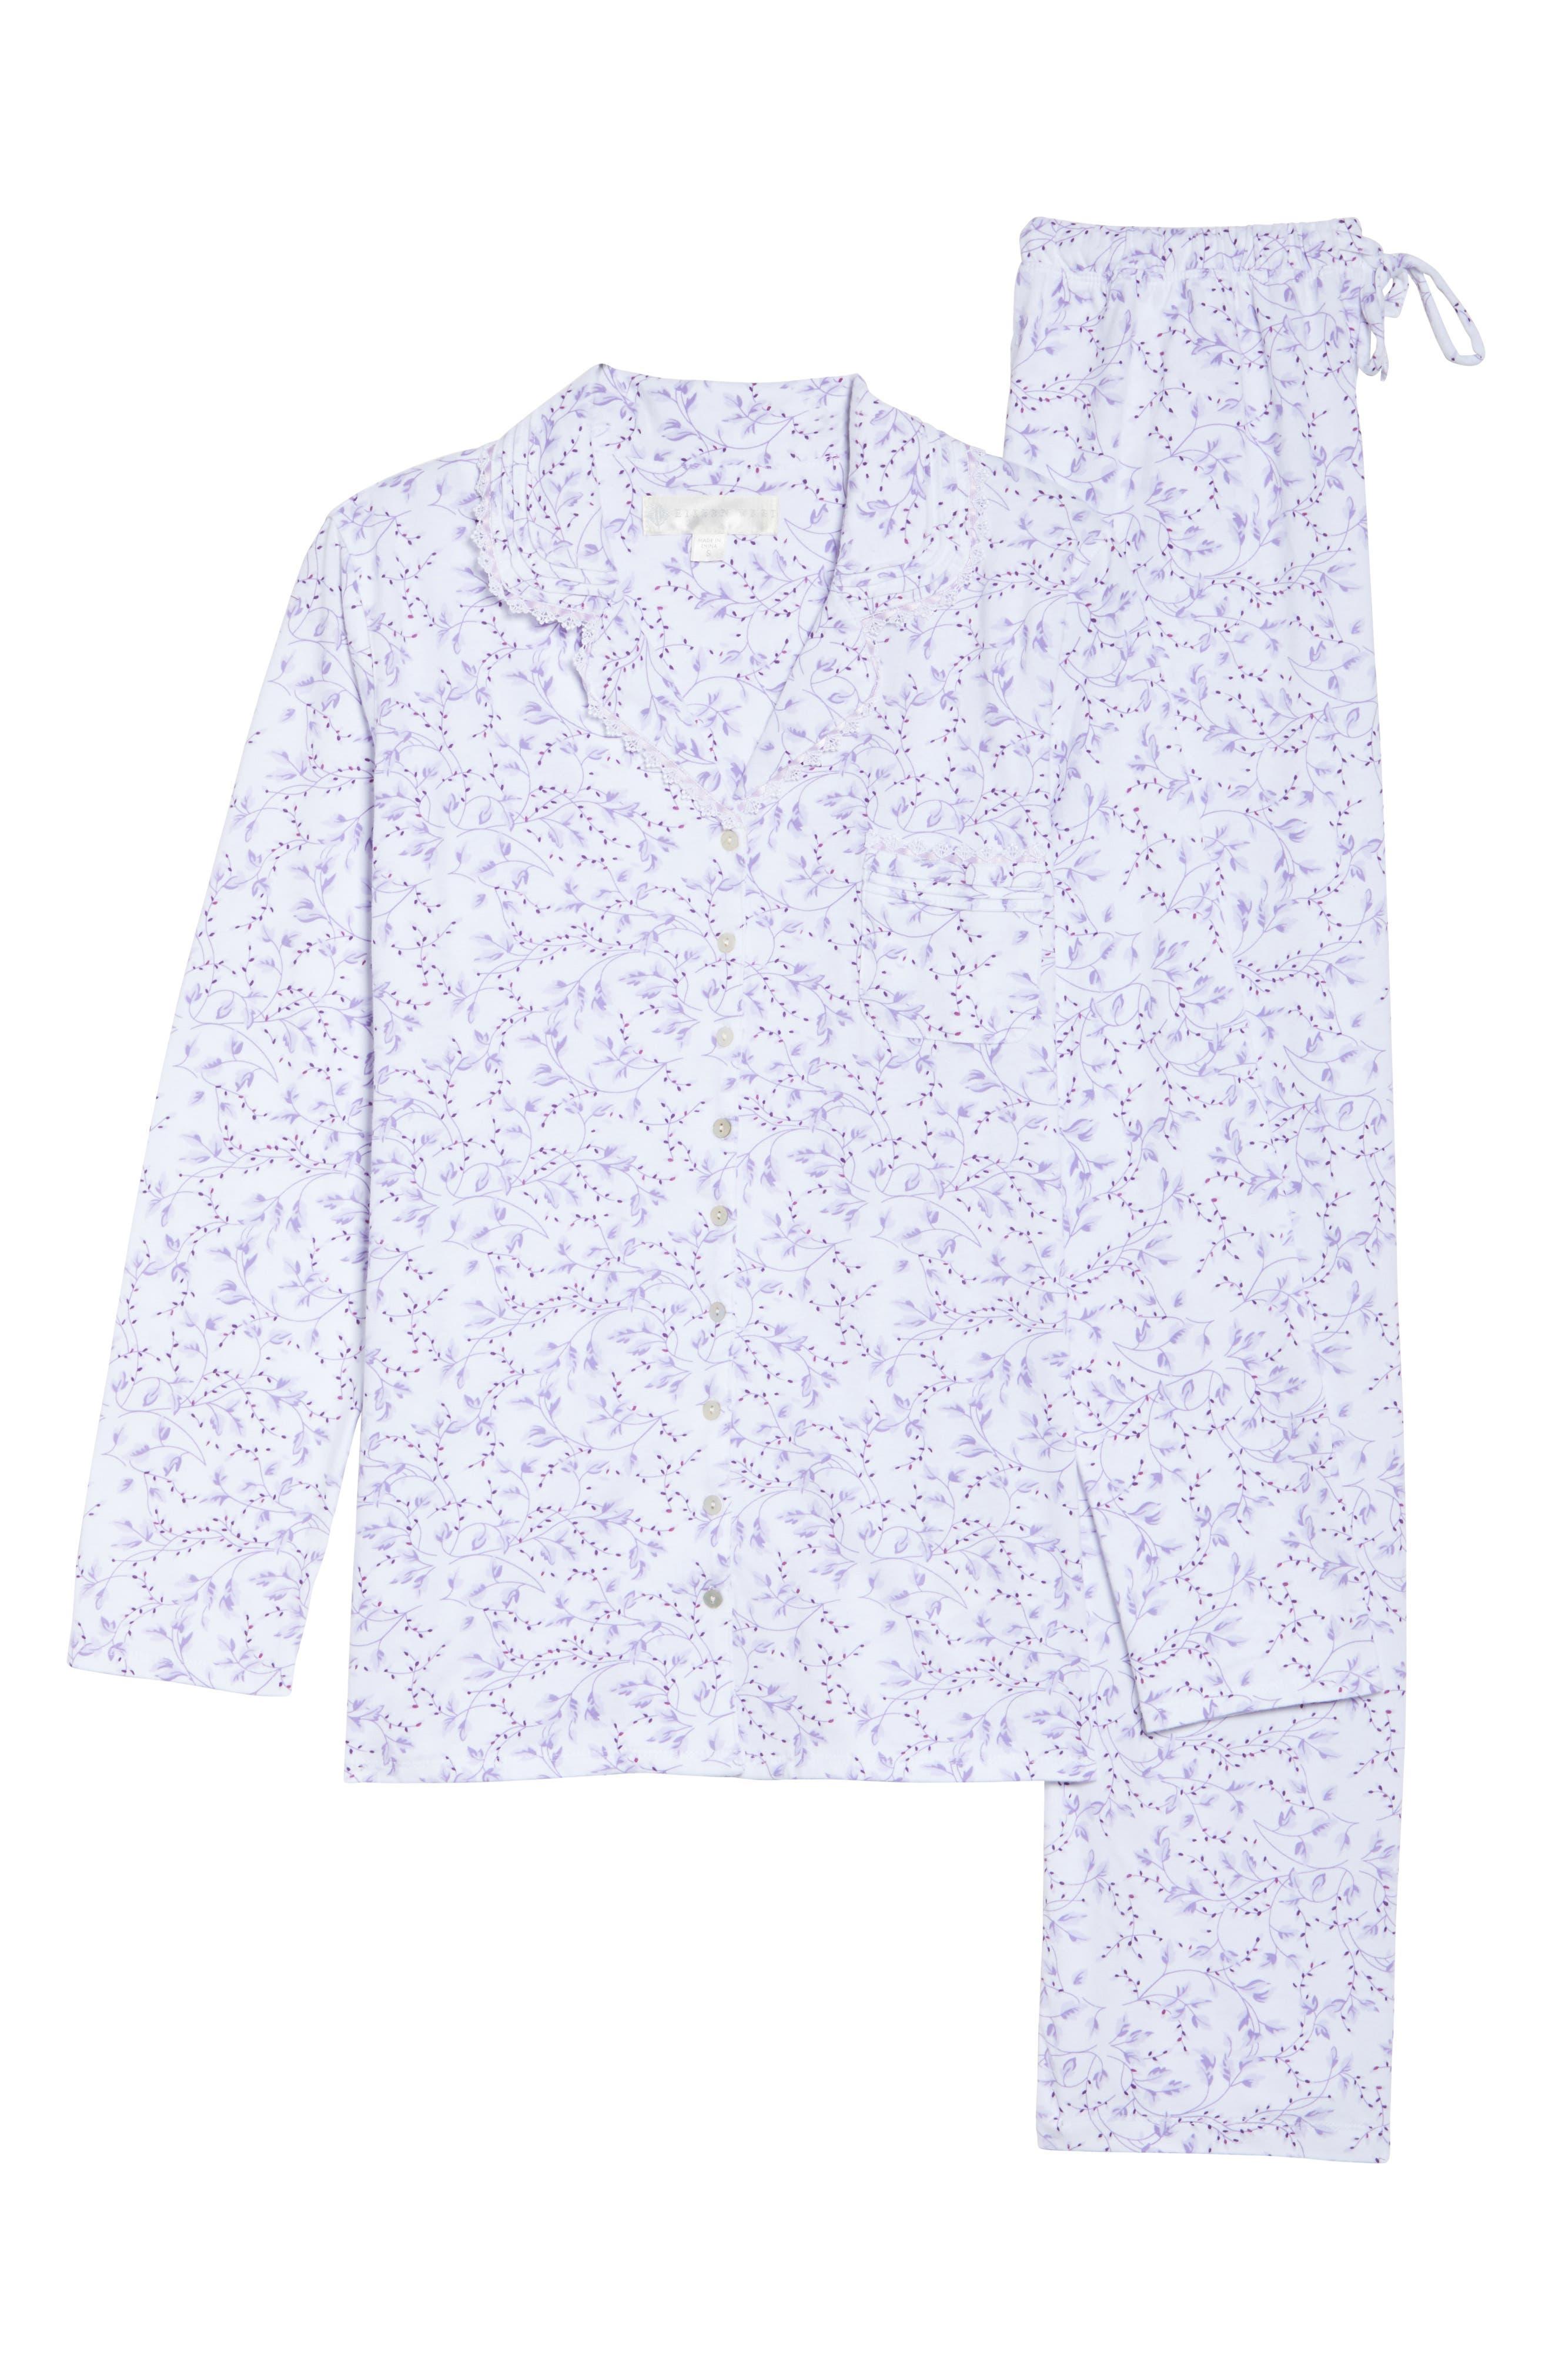 Notch Collar Pajamas,                             Alternate thumbnail 6, color,                             110